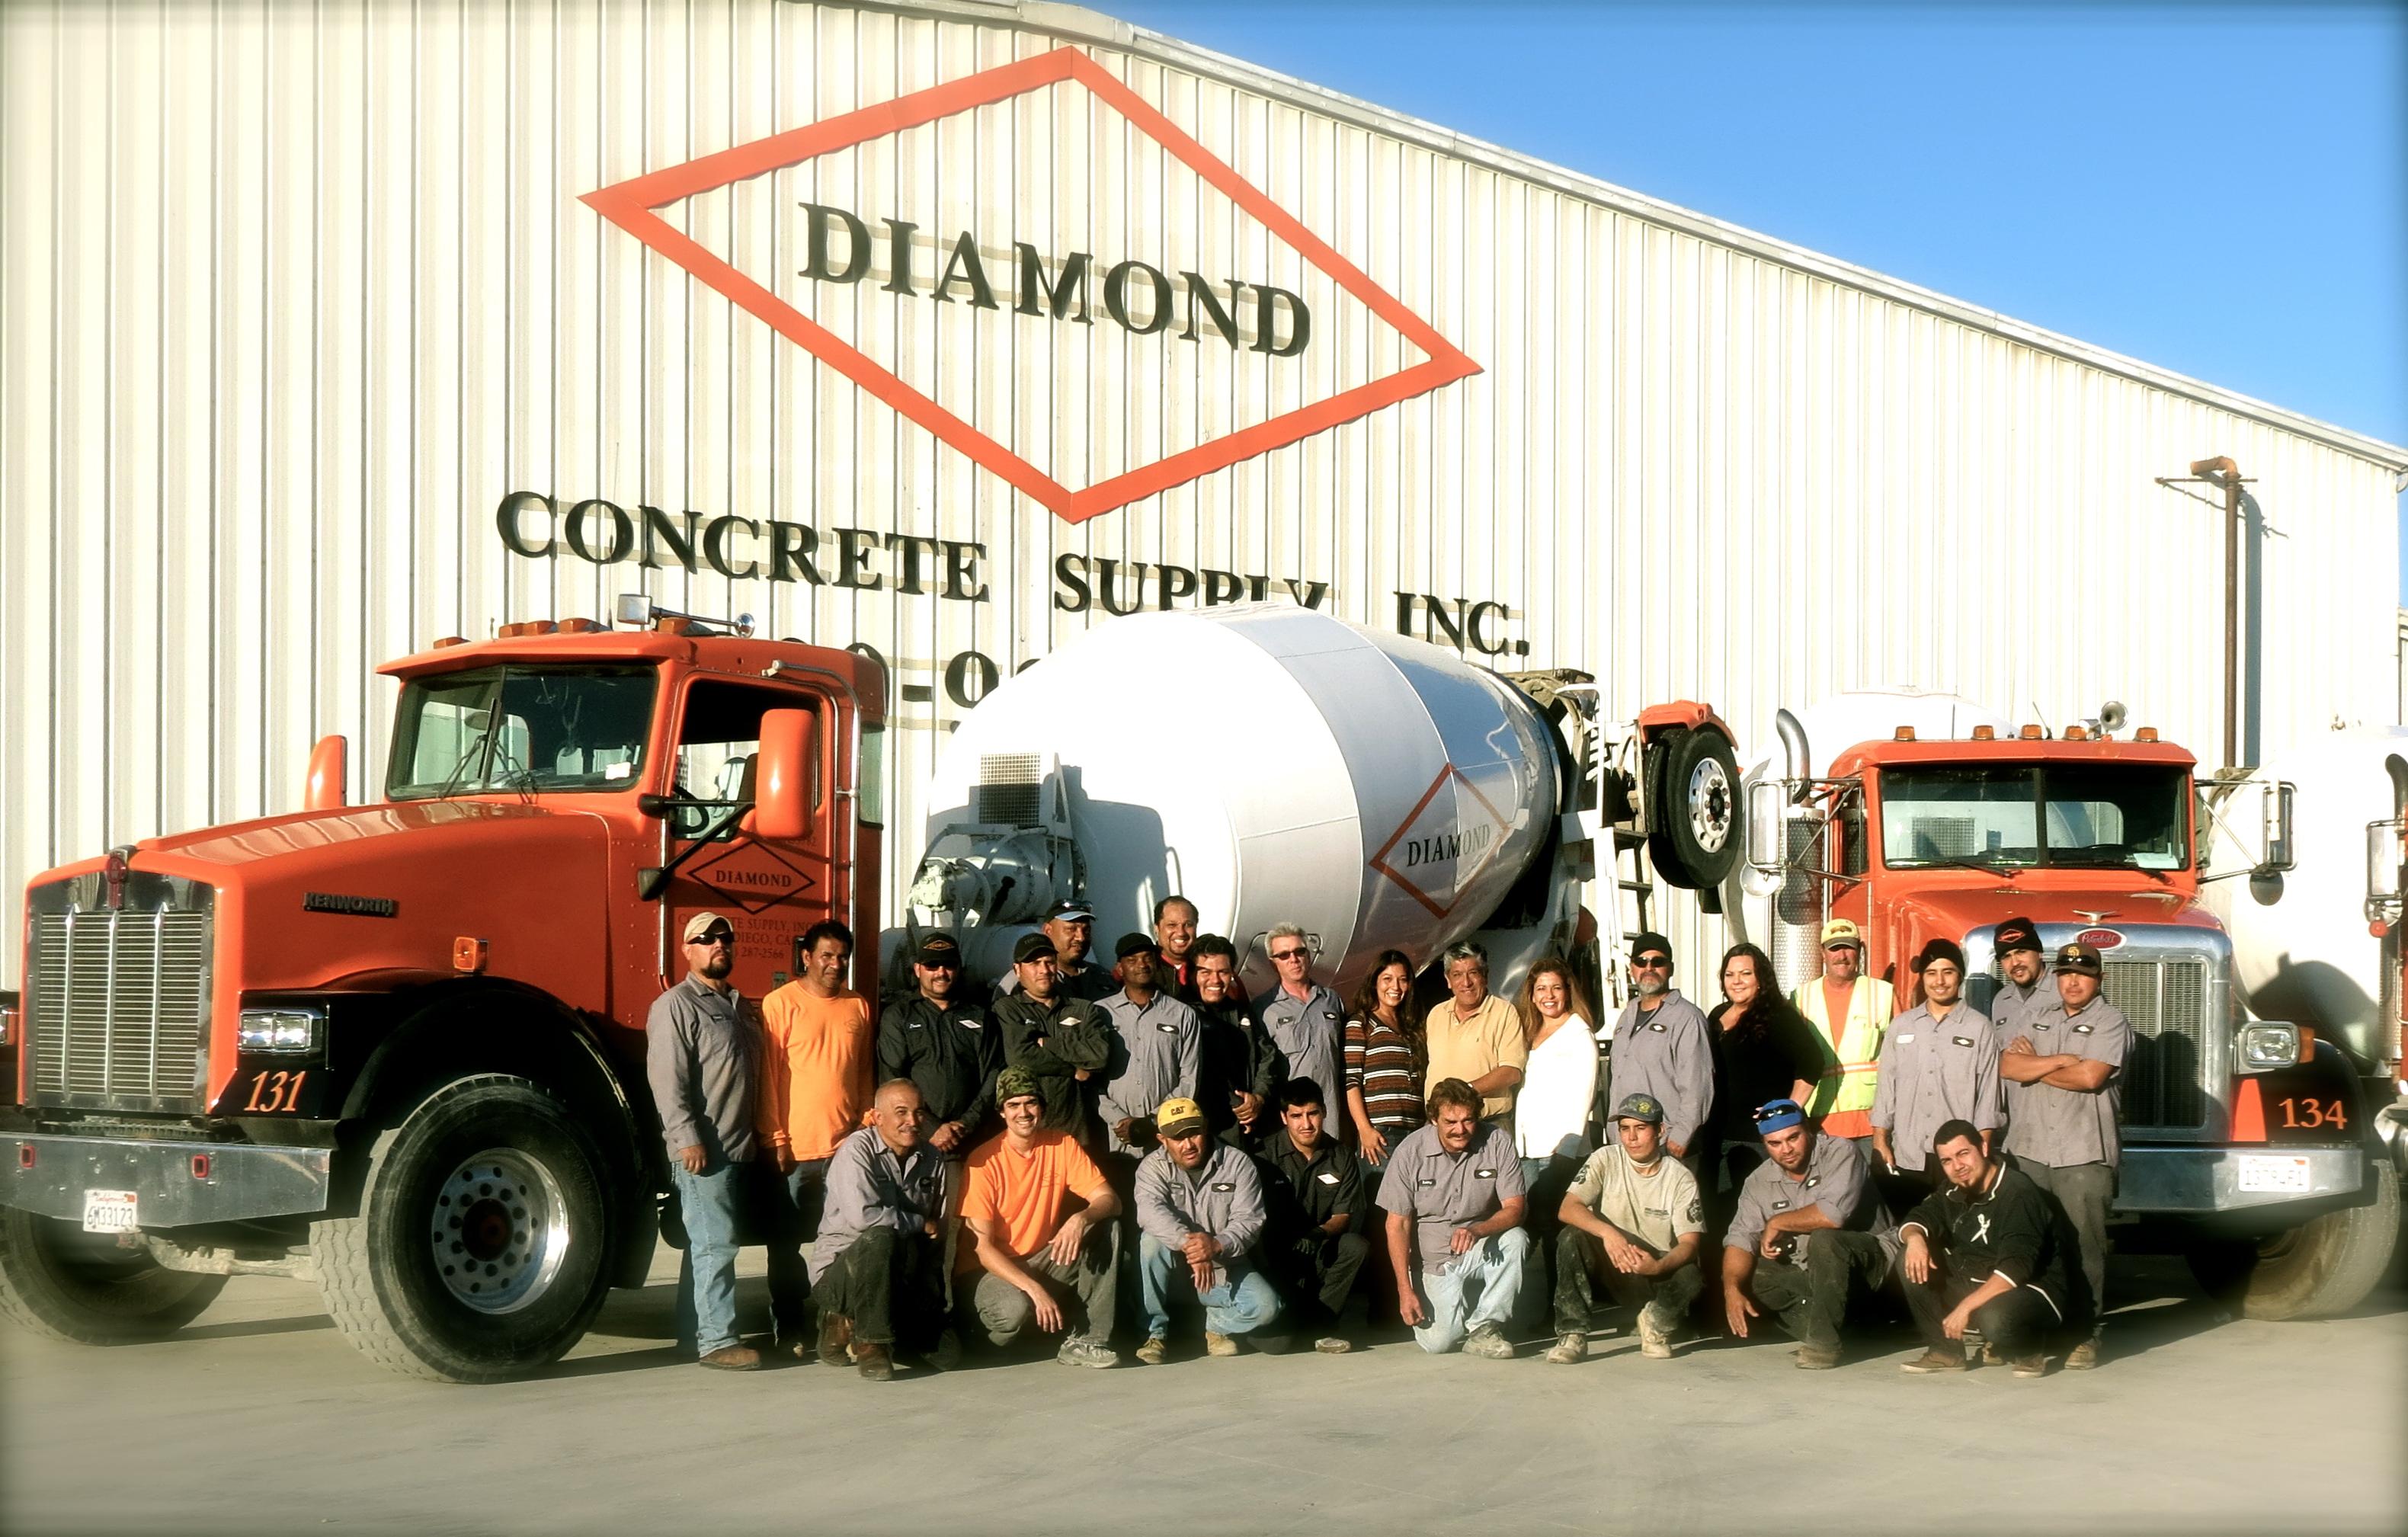 Diamond Concrete Supply image 1